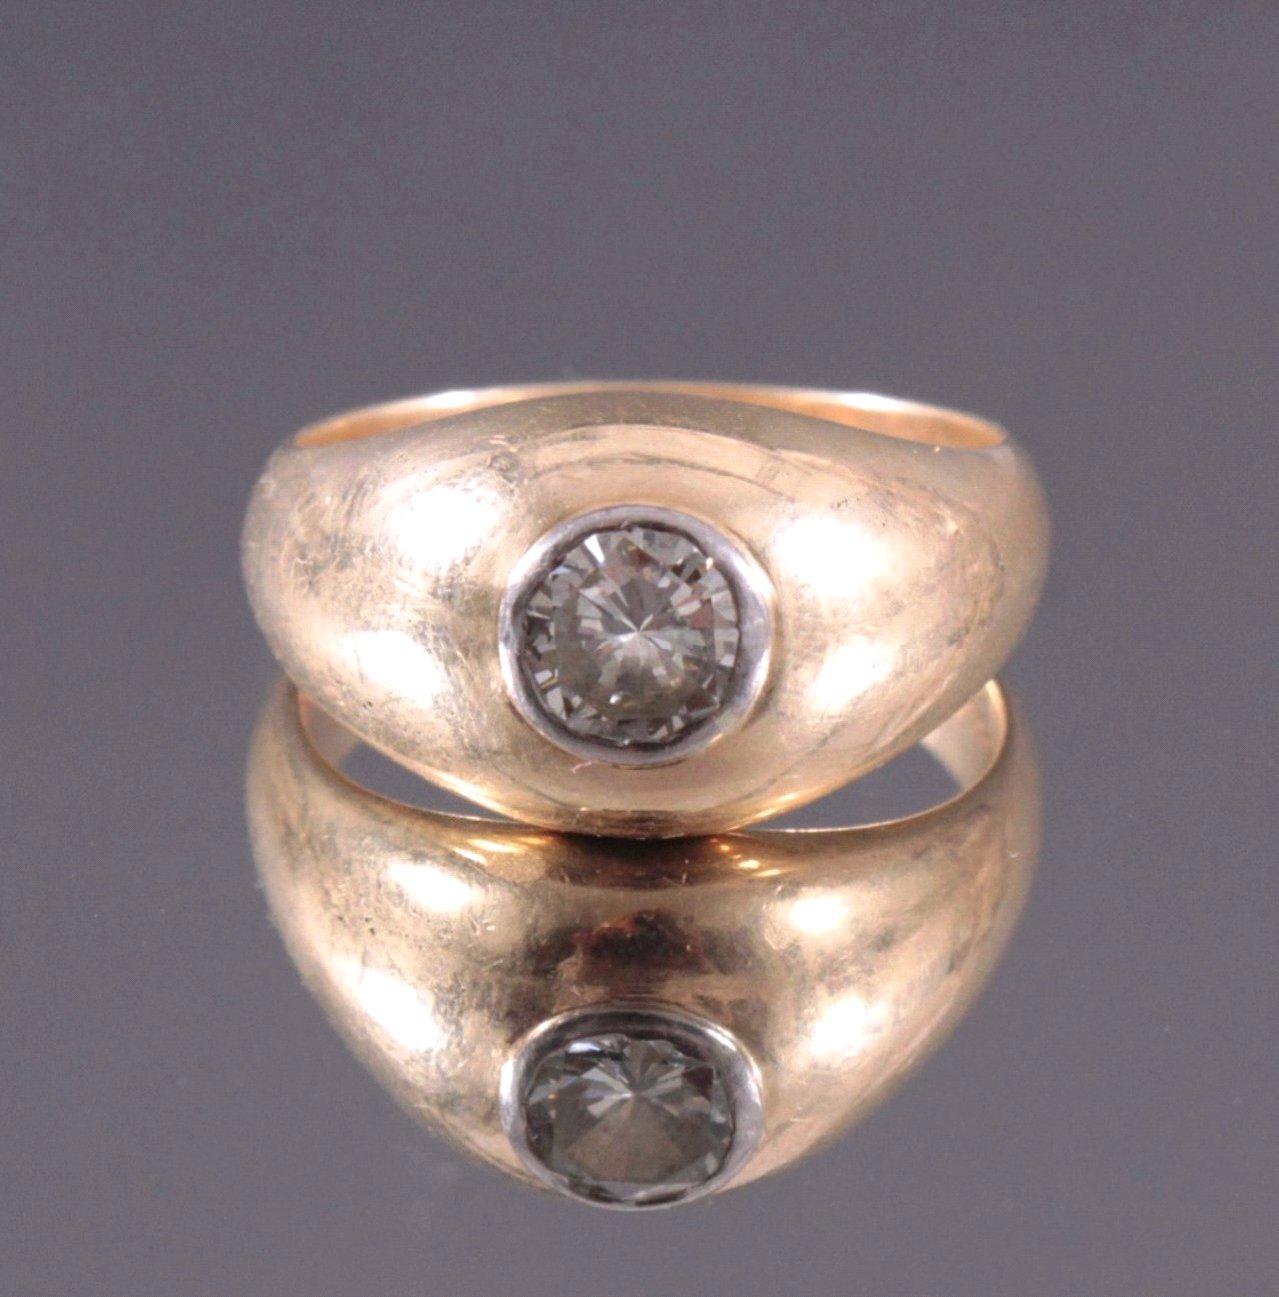 Herrenring mit großem Diamant, 585/000 Gelbgold